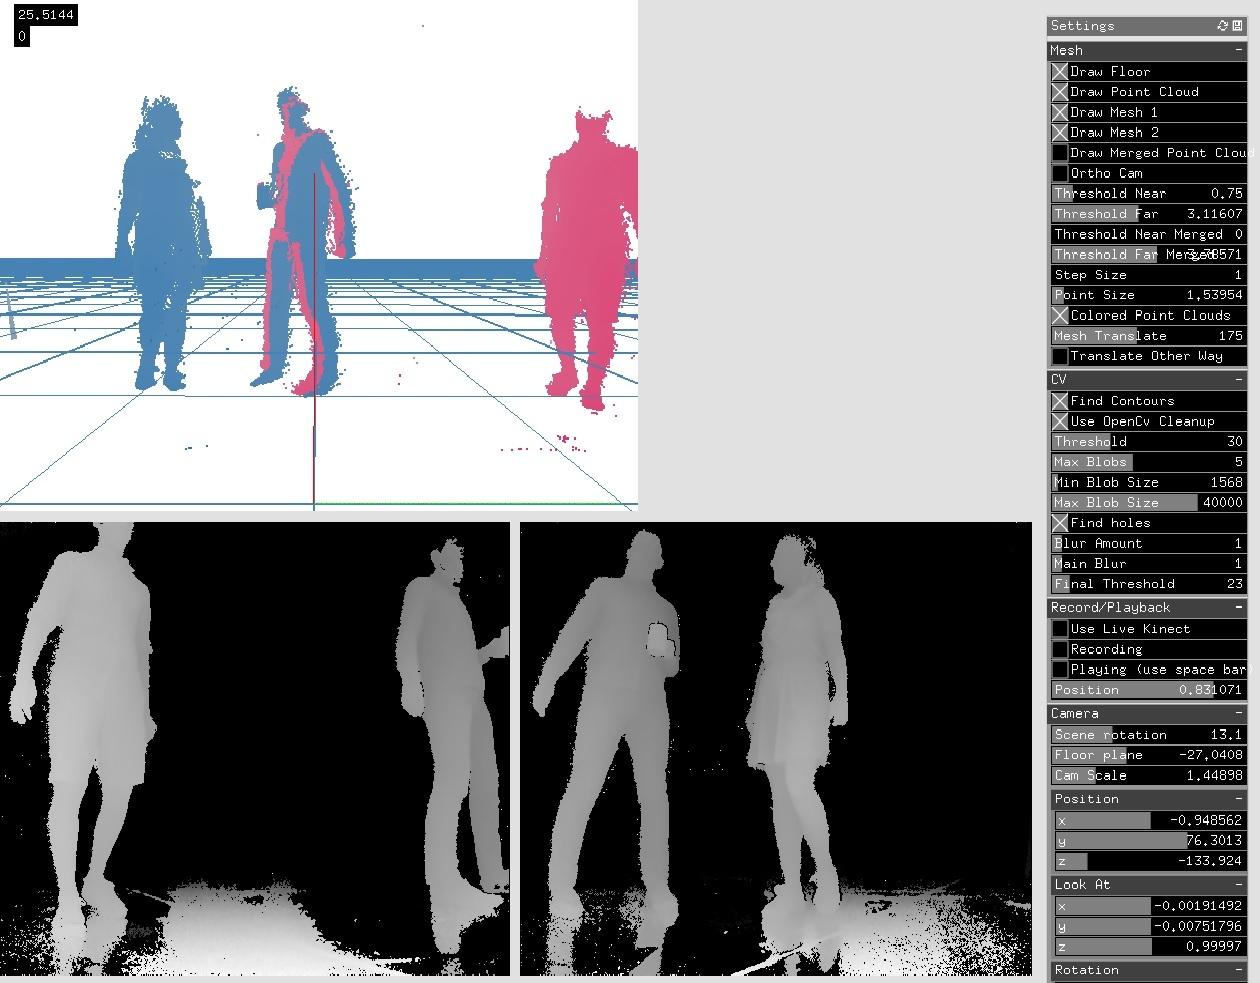 User segmentation/3D blob tracking on multi-kinect data - advanced